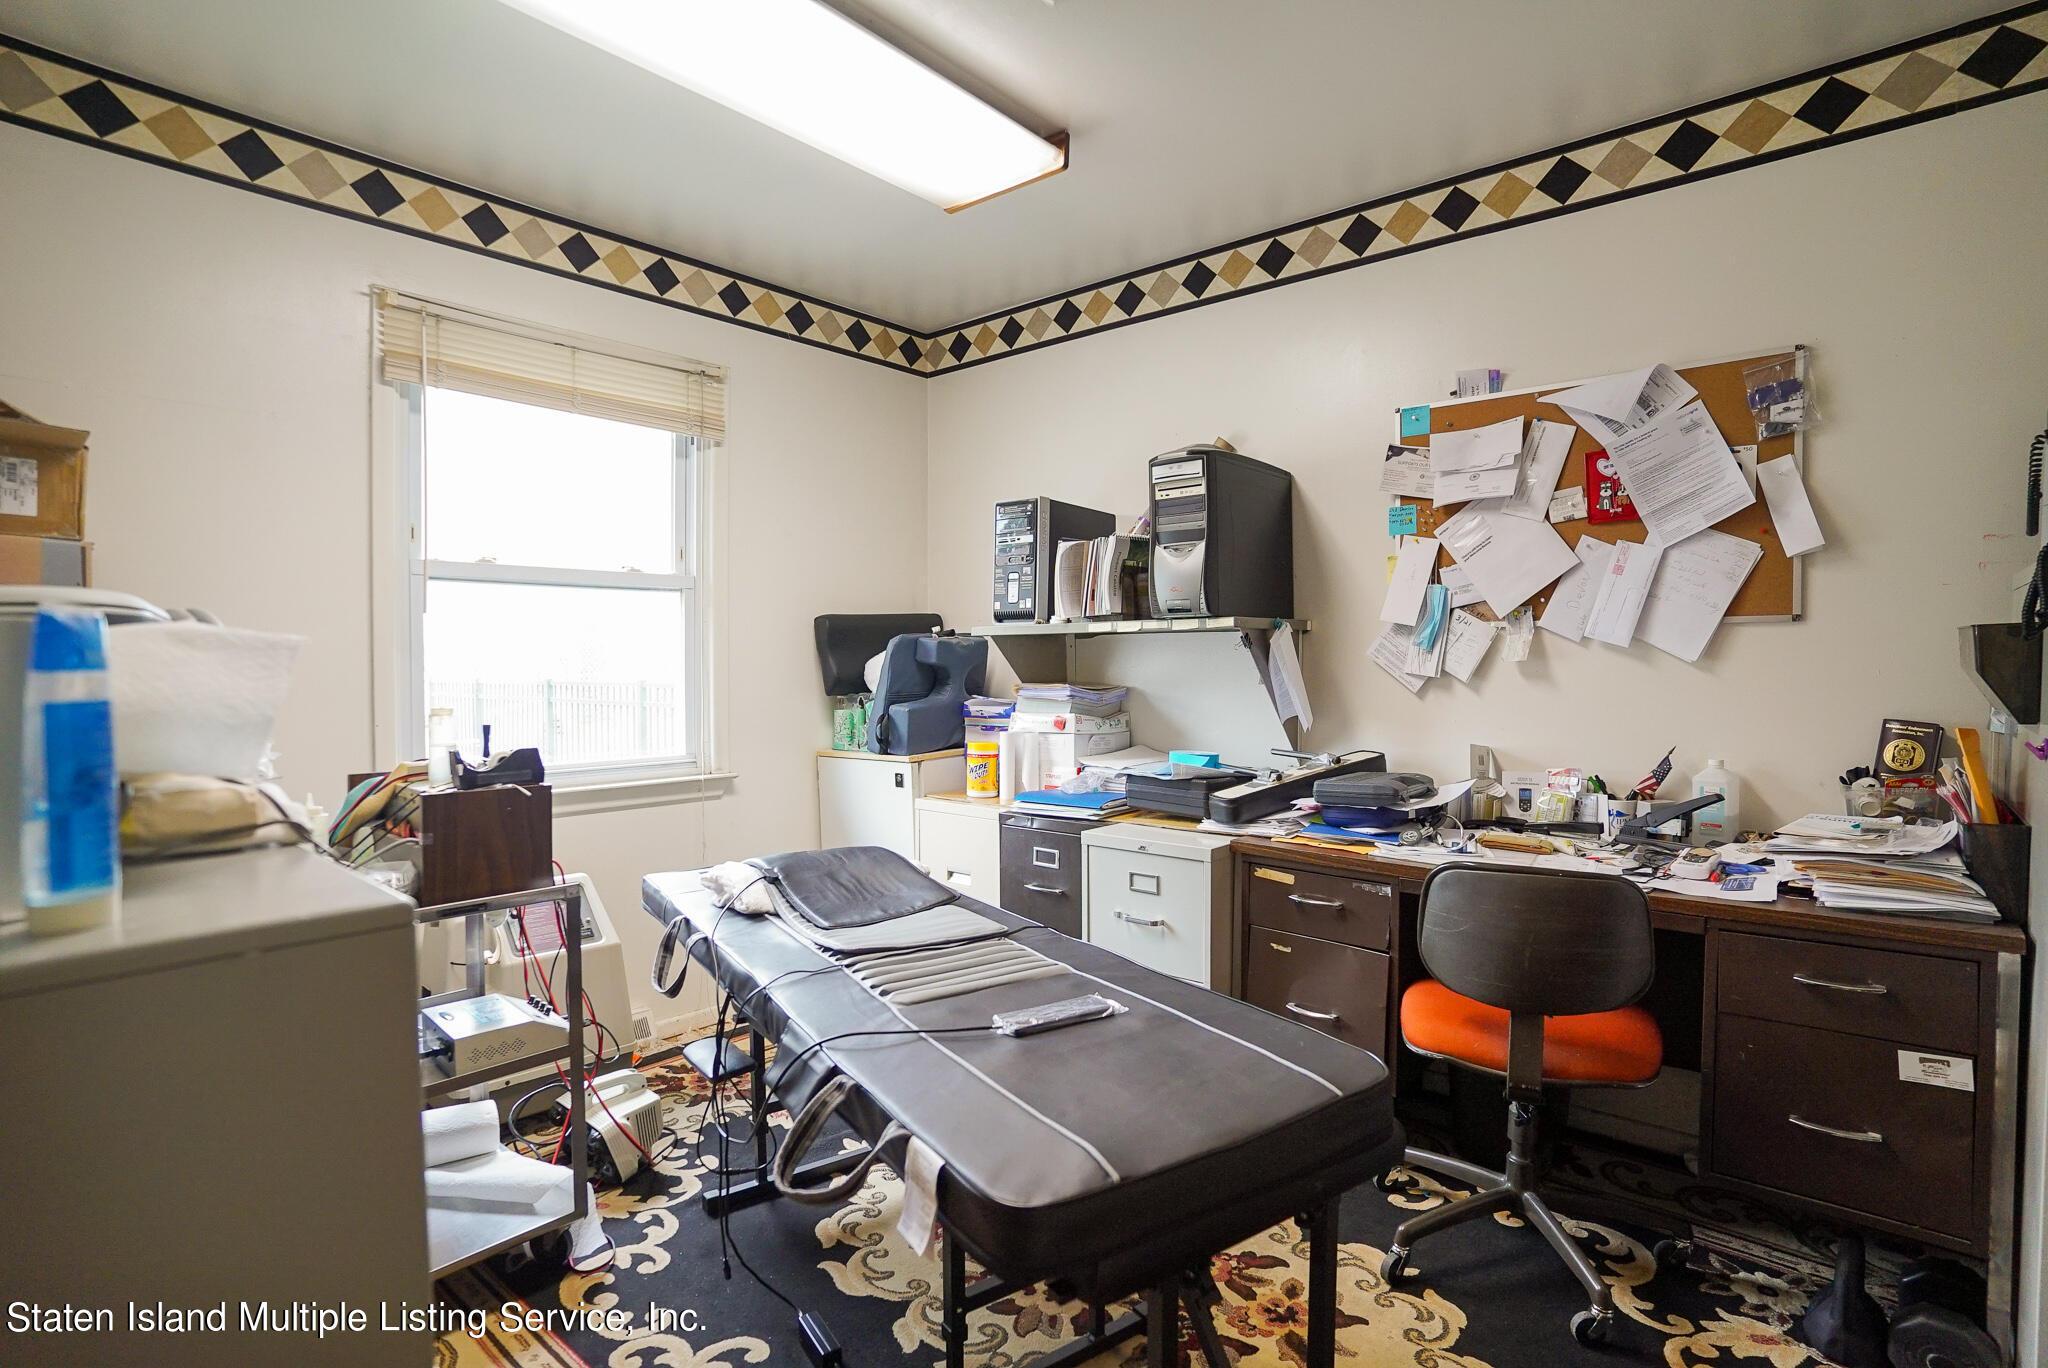 Single Family - Detached 121 Parkinson Avenue  Staten Island, NY 10305, MLS-1147747-20